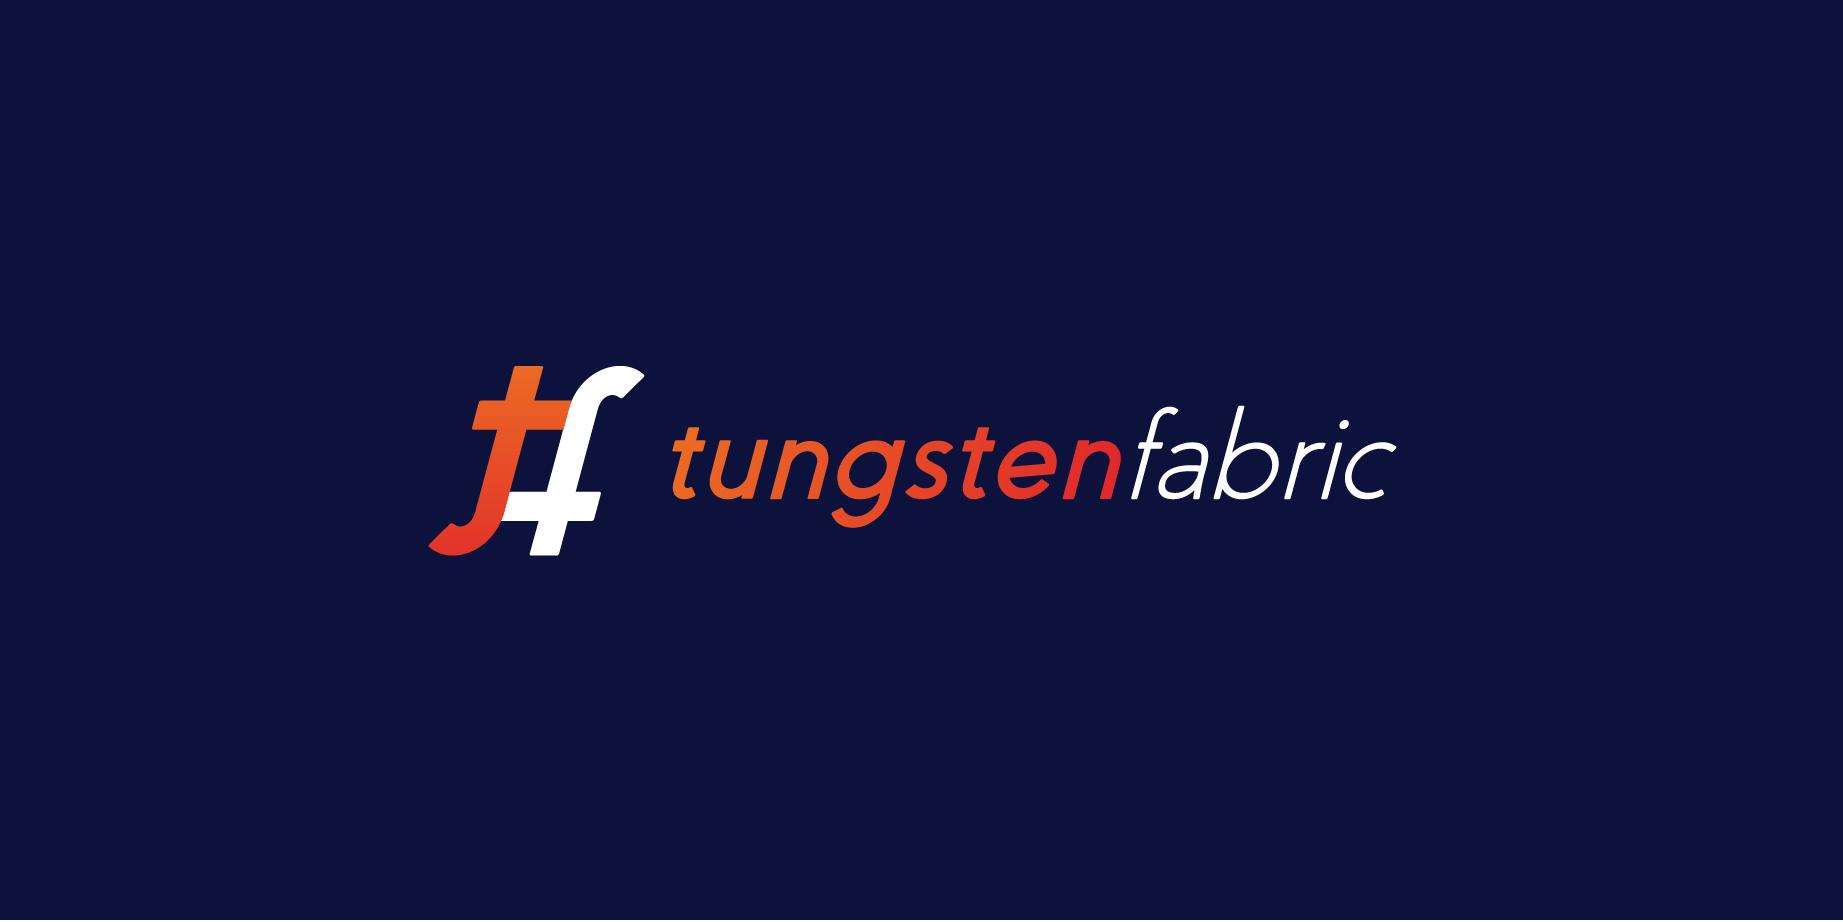 Tungsten Fabric Long Logo